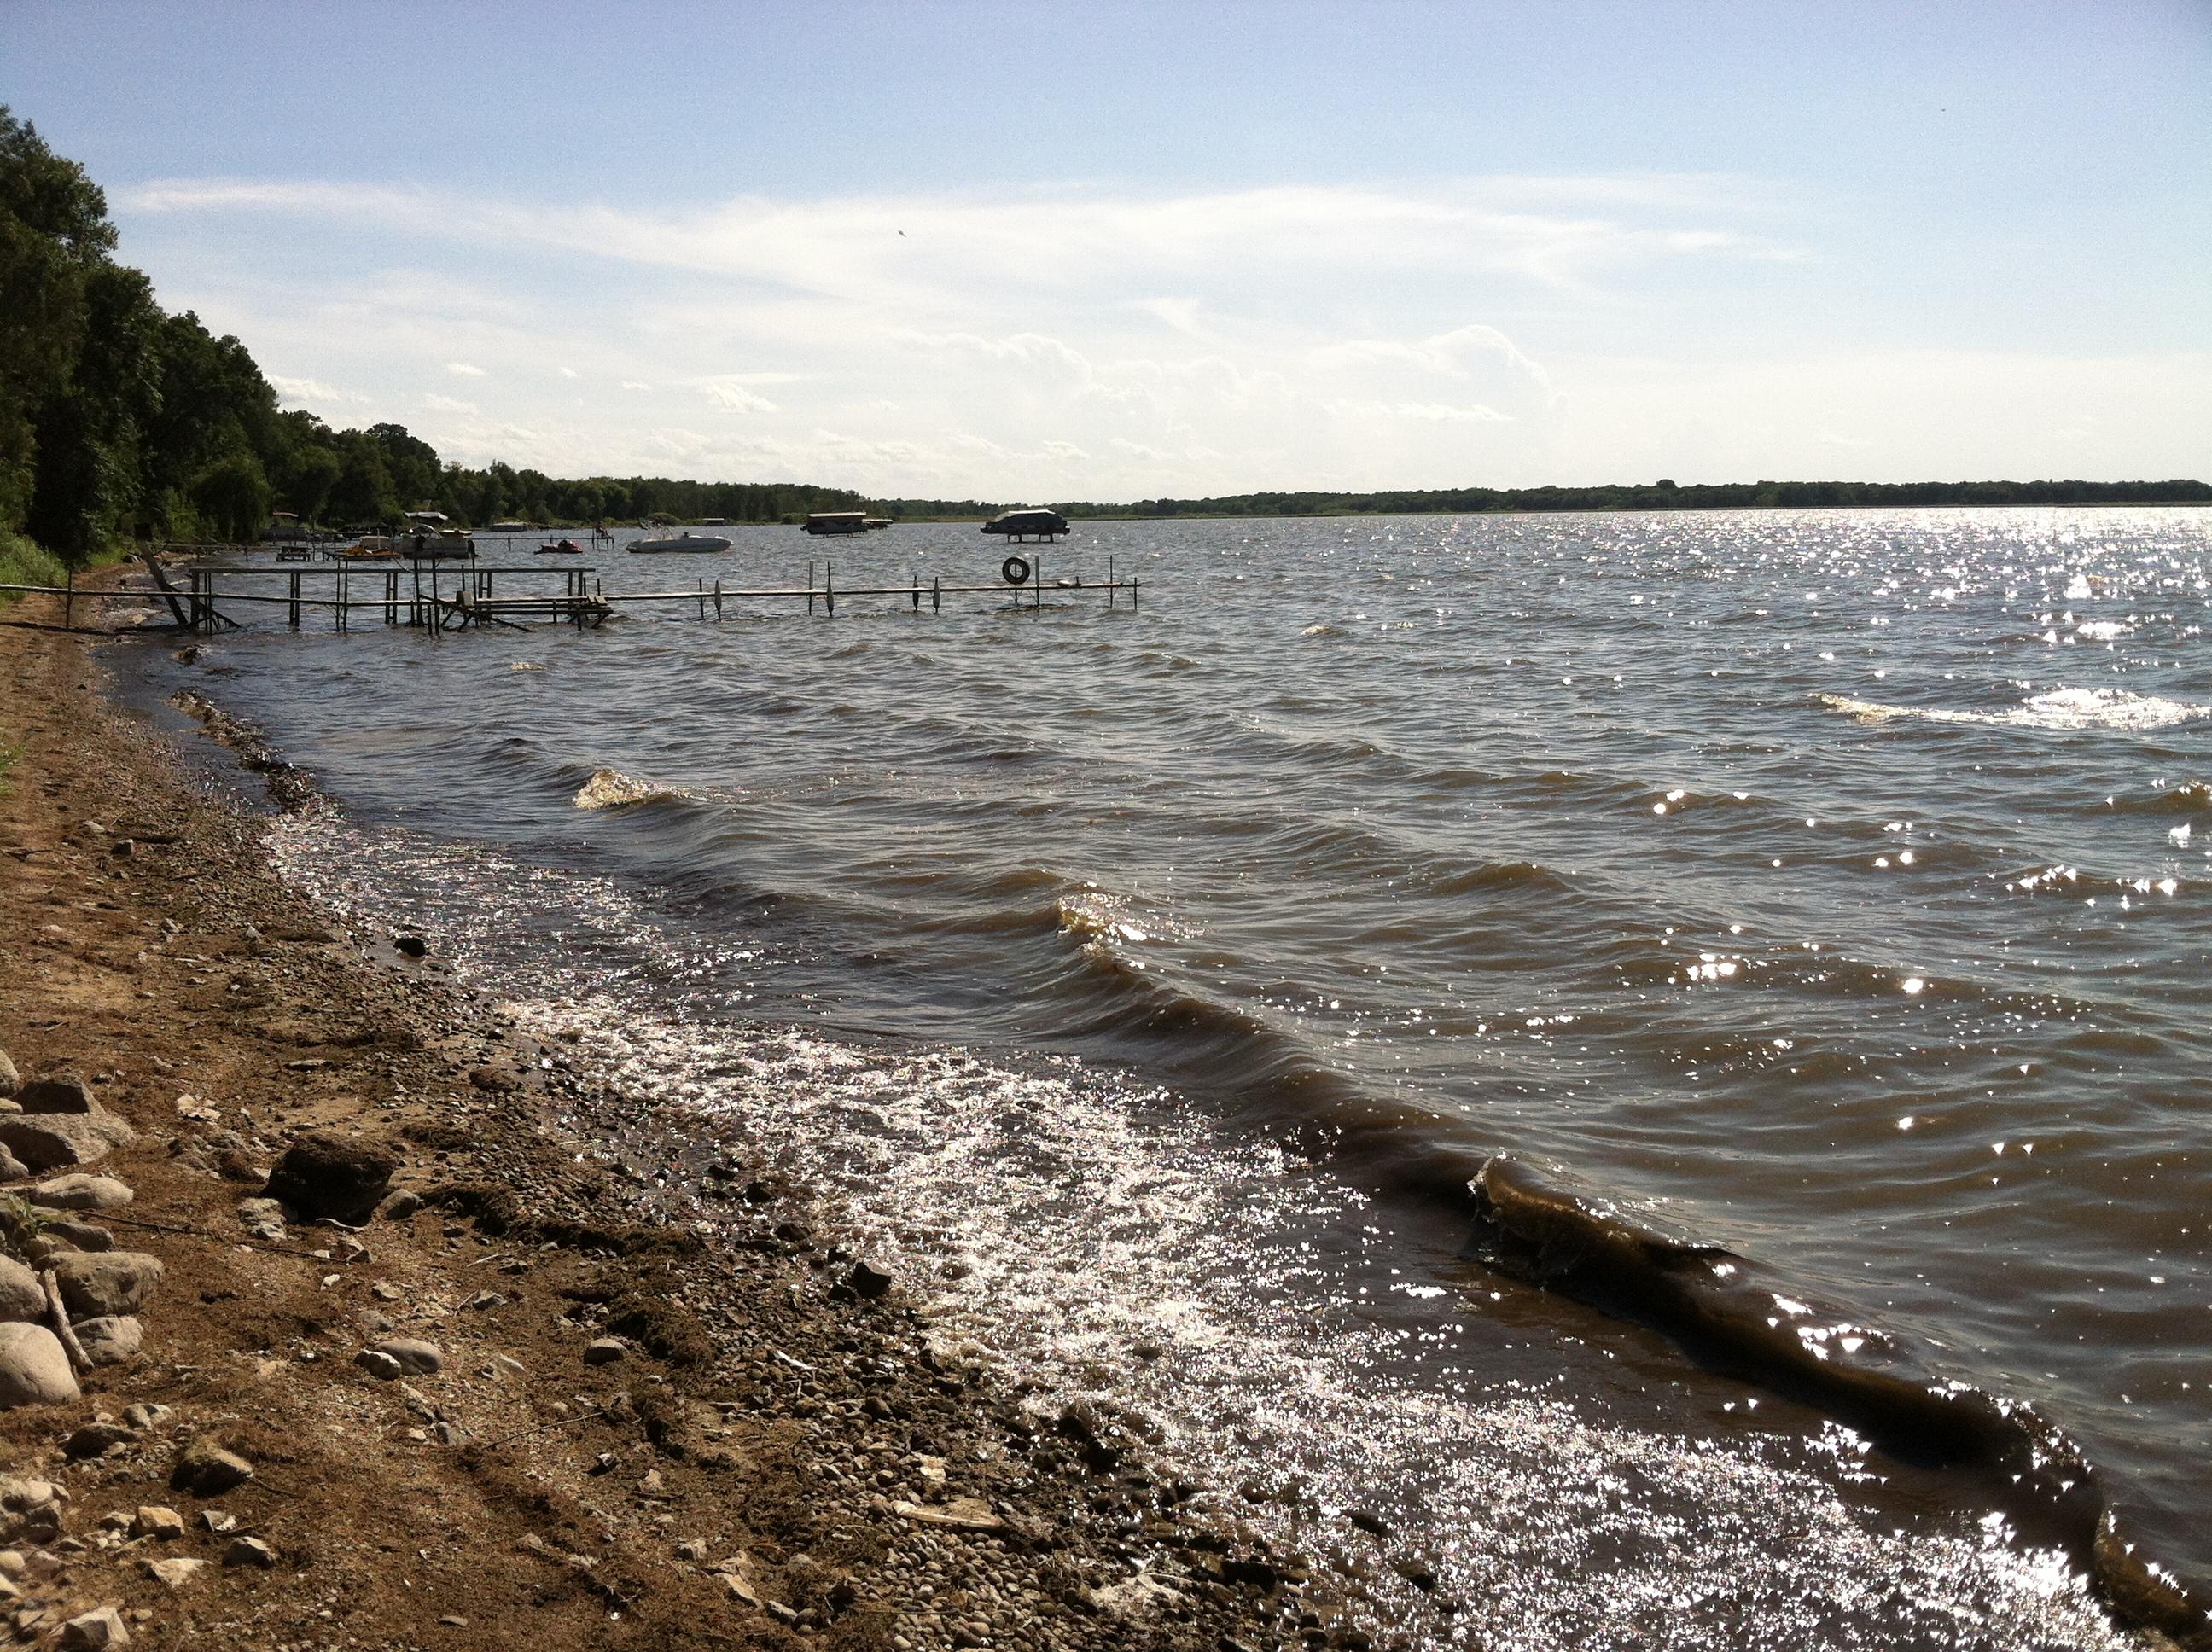 Lake koshkonong shoreline images as of august 1 rock for Lake koshkonong fishing report